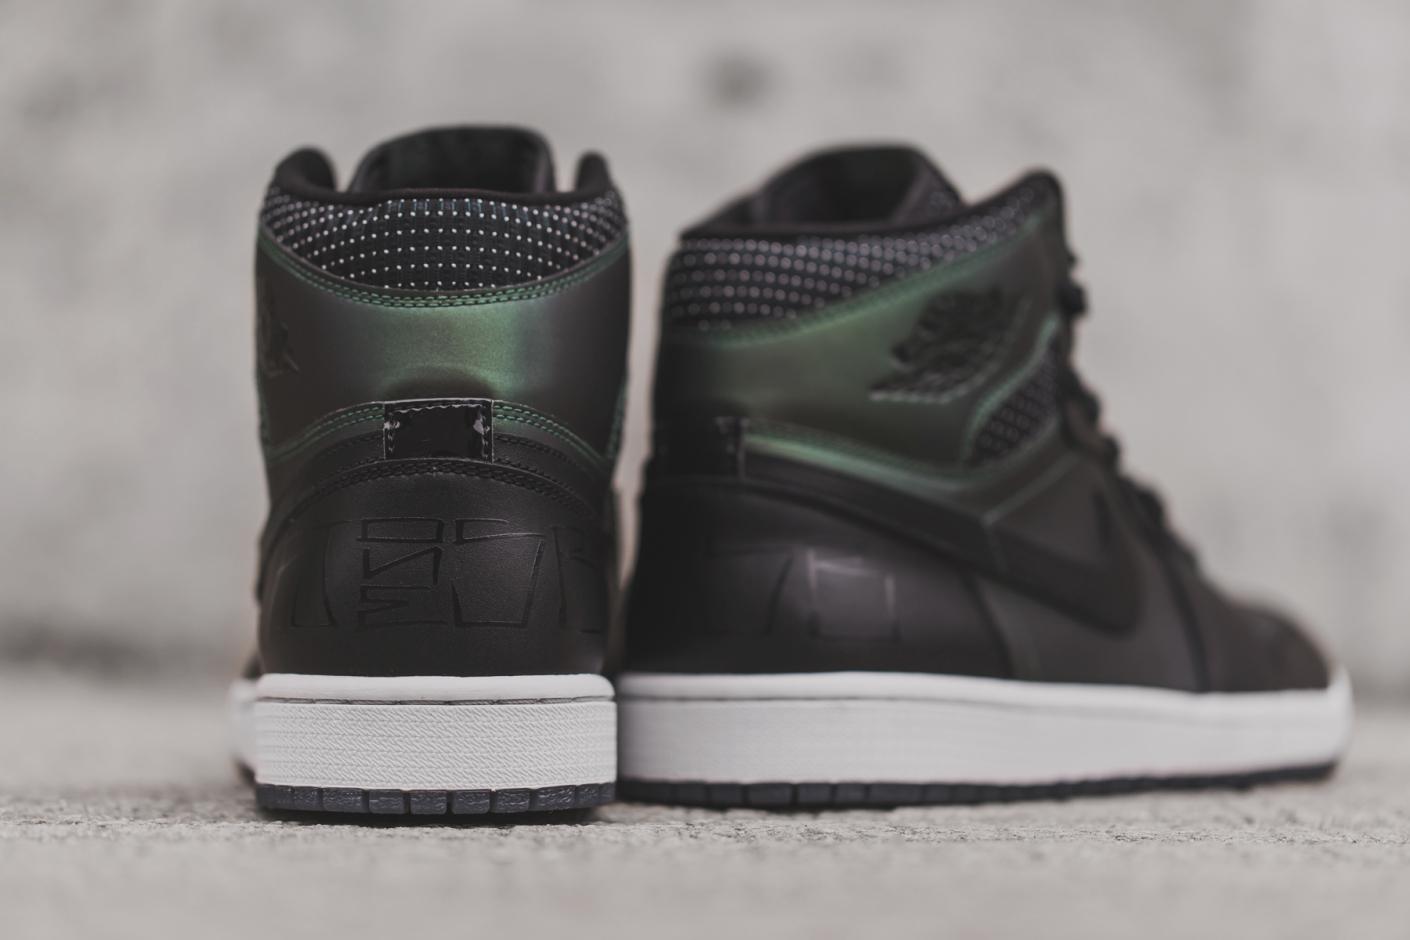 Nike SB x Air Jordan 1 by Craig Stecyk 6